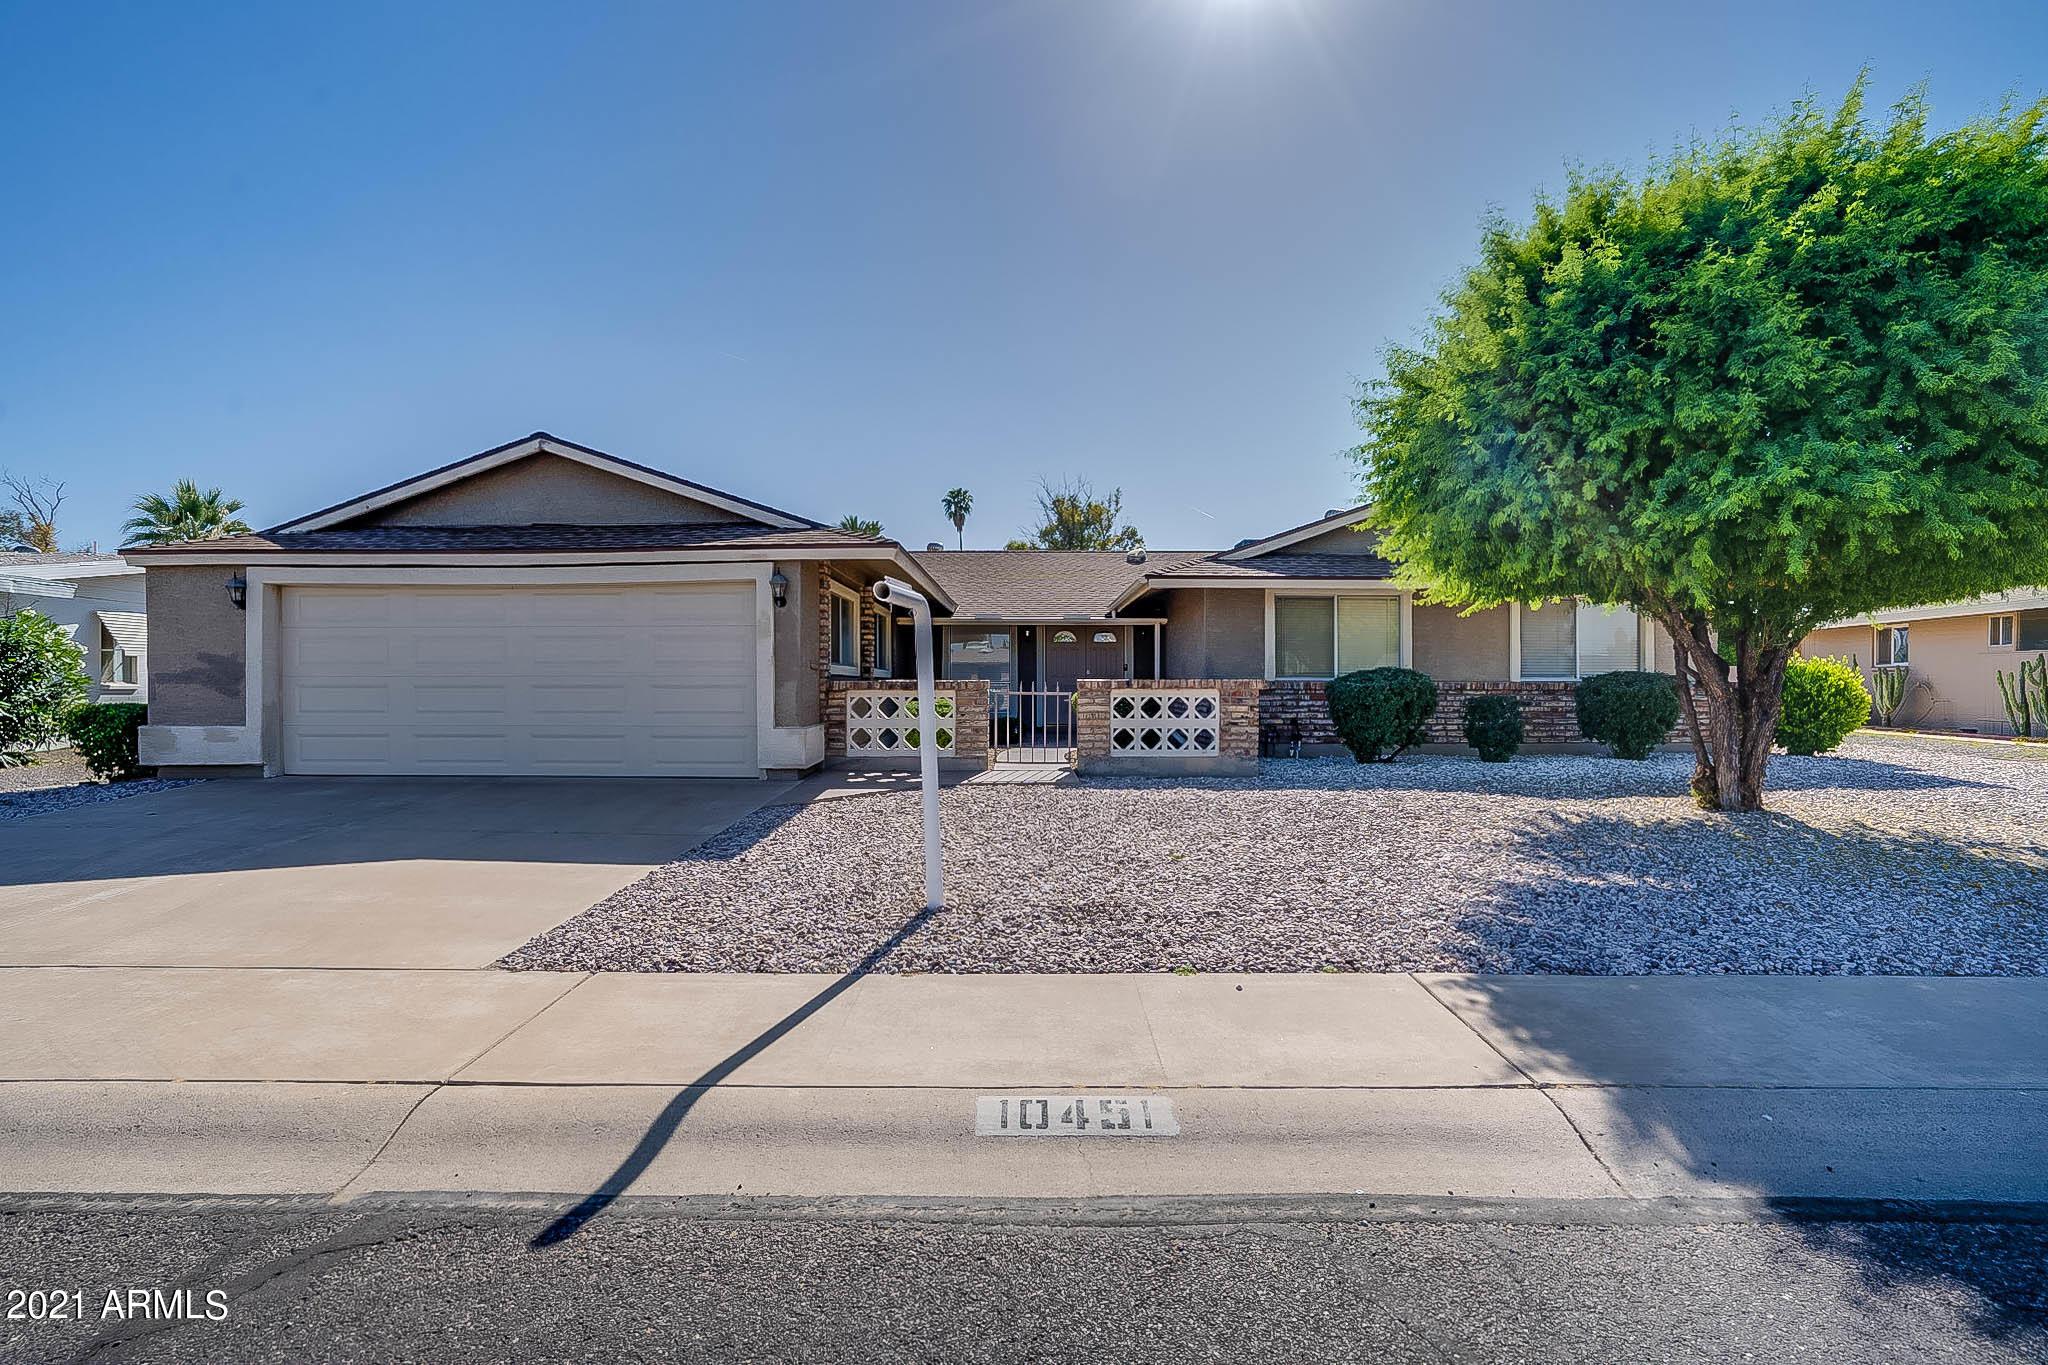 10451 W Wininger Circle, Sun City AZ 85351 - Photo 1